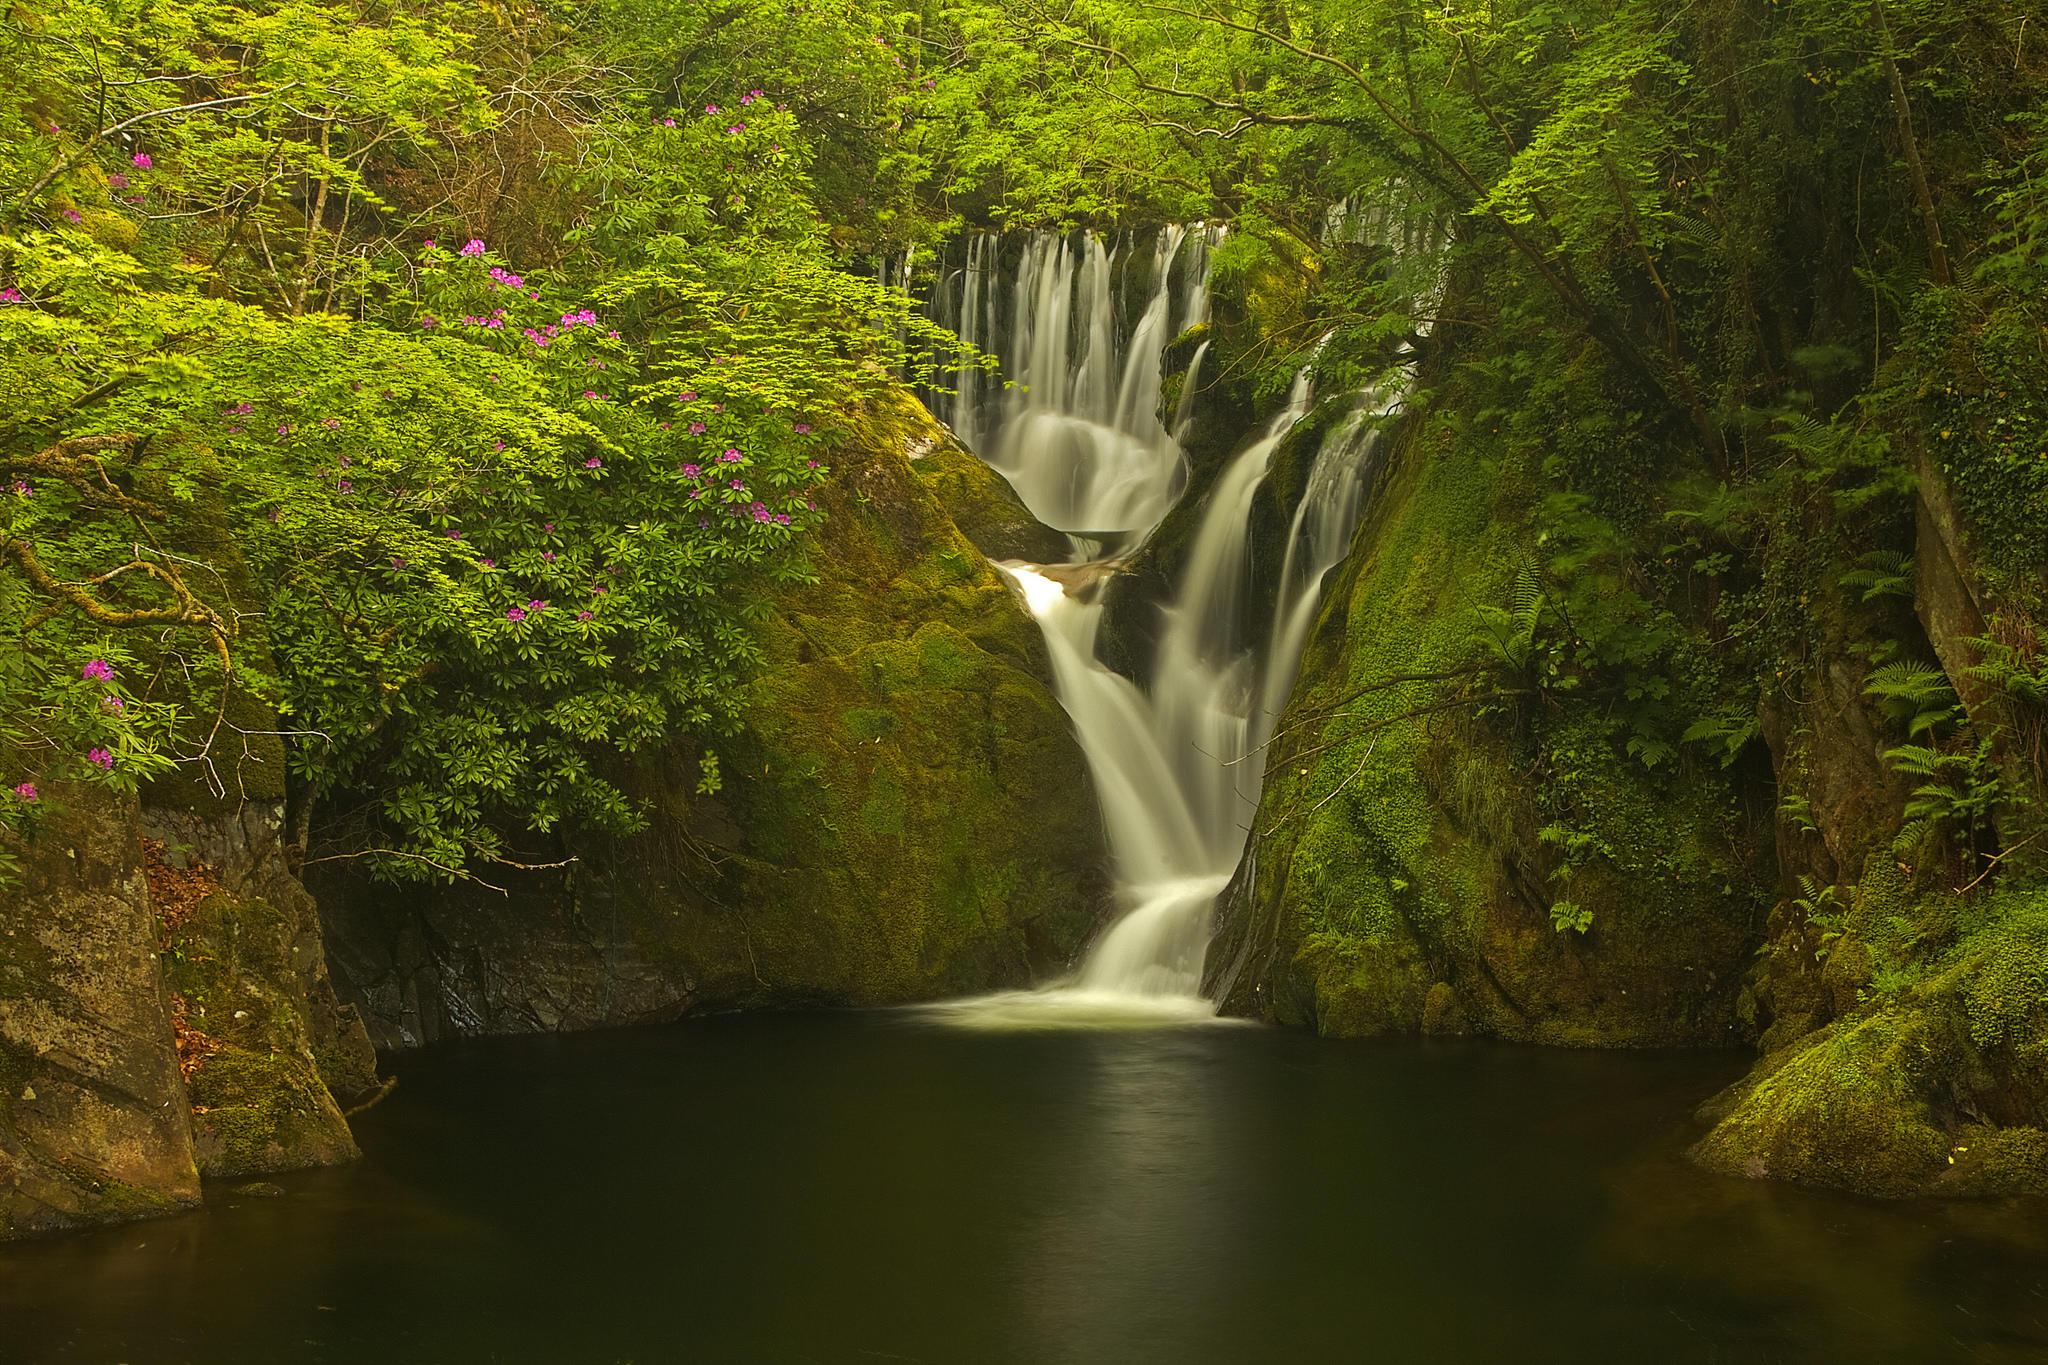 обои Machynlleth, Уэльс, Великобритания, лес картинки фото